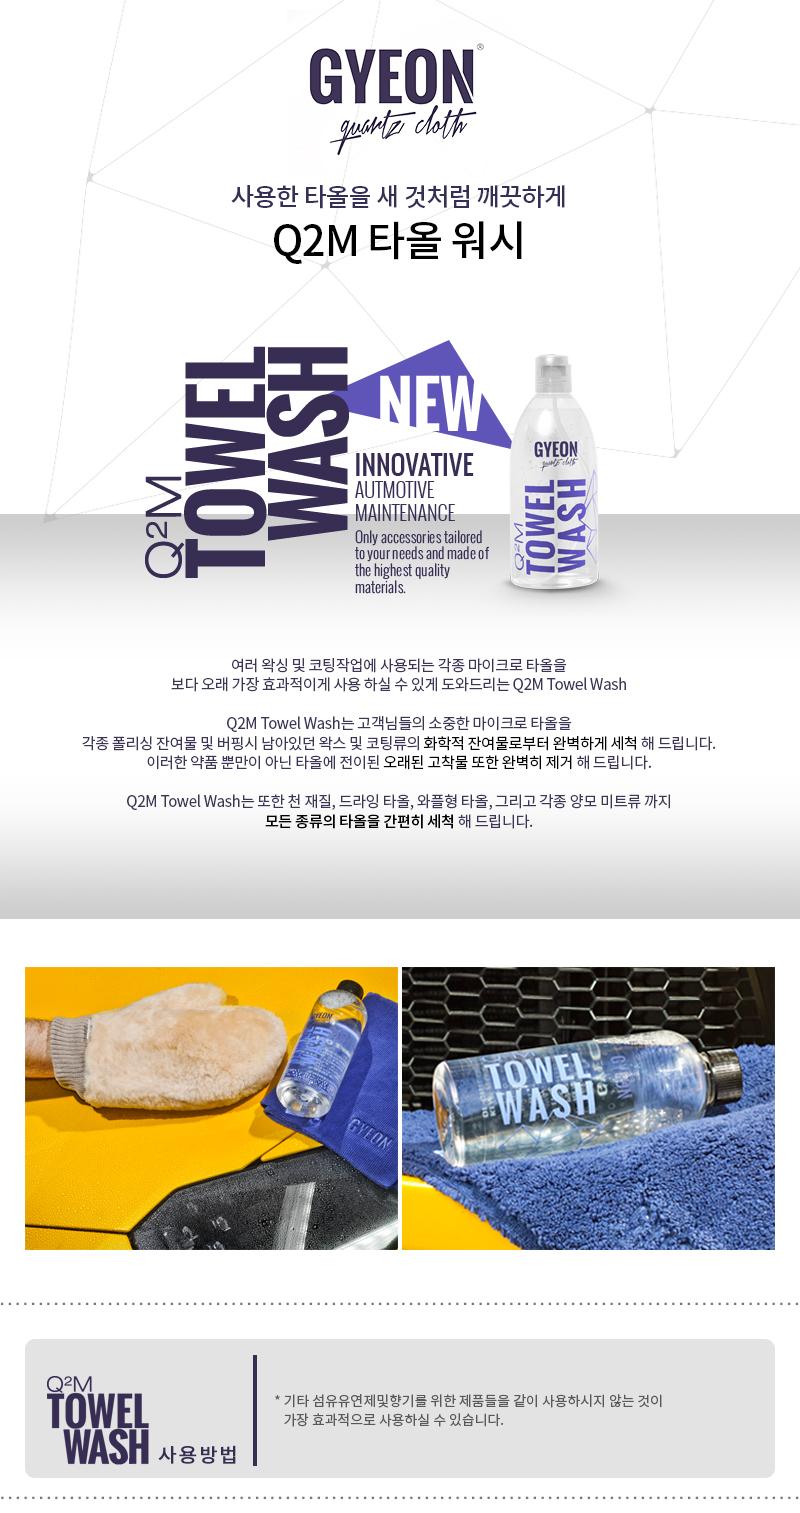 Towel_Wash_500.jpg